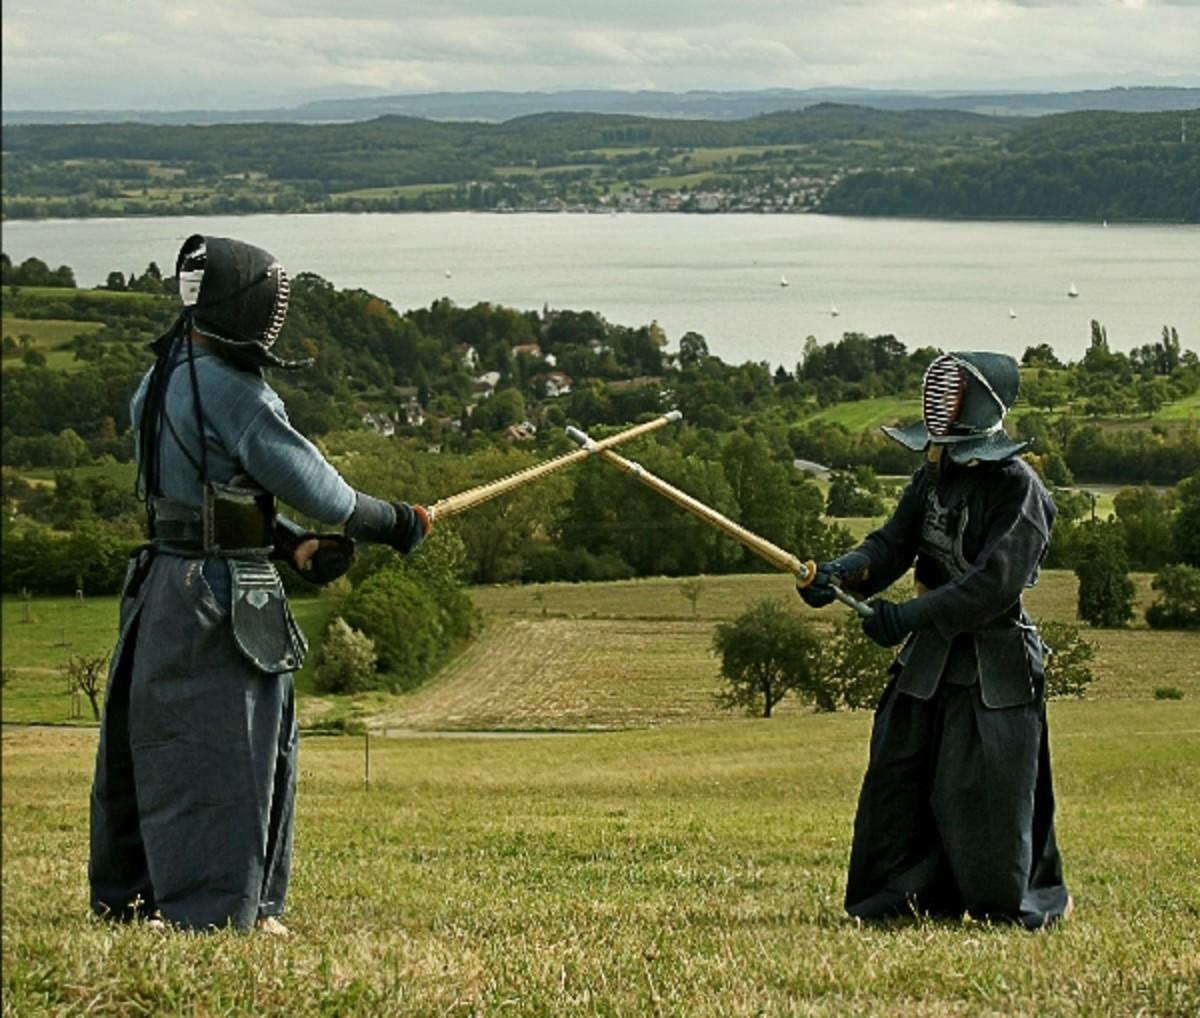 kendo-japanese-martial-art-of-fencing